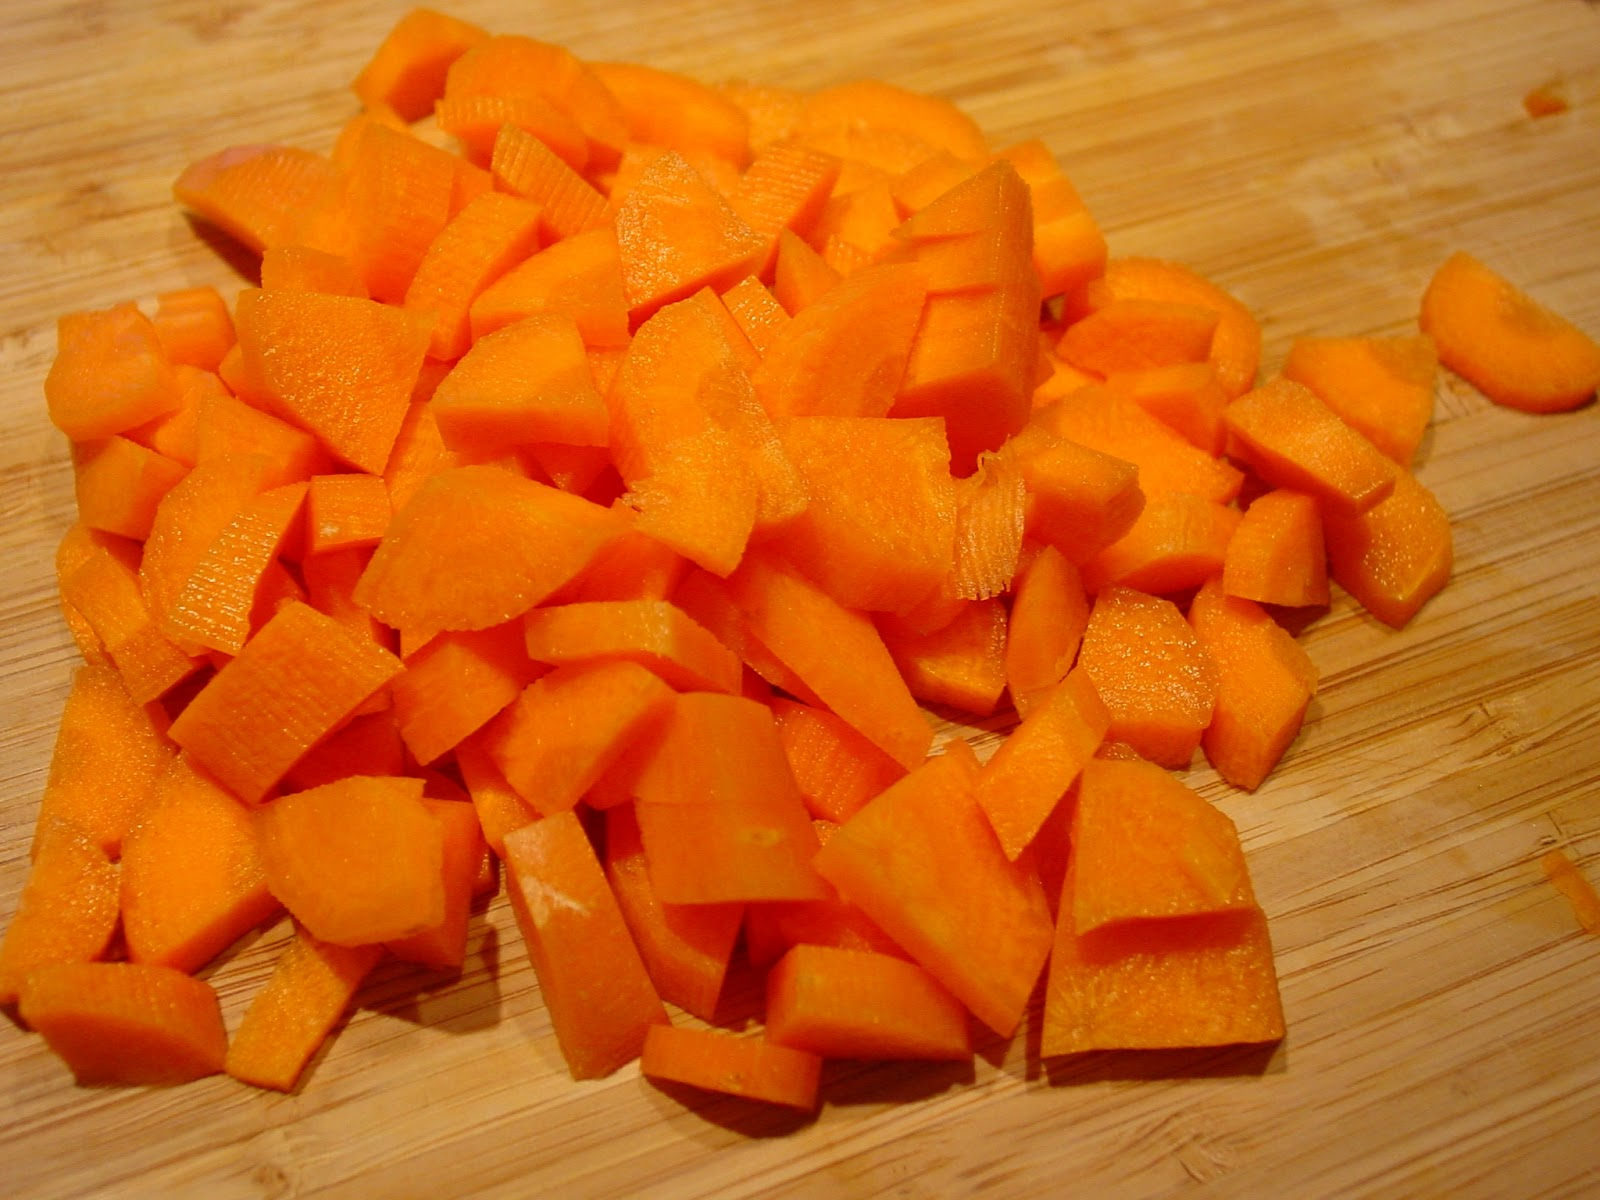 chopped carrots - photo #21